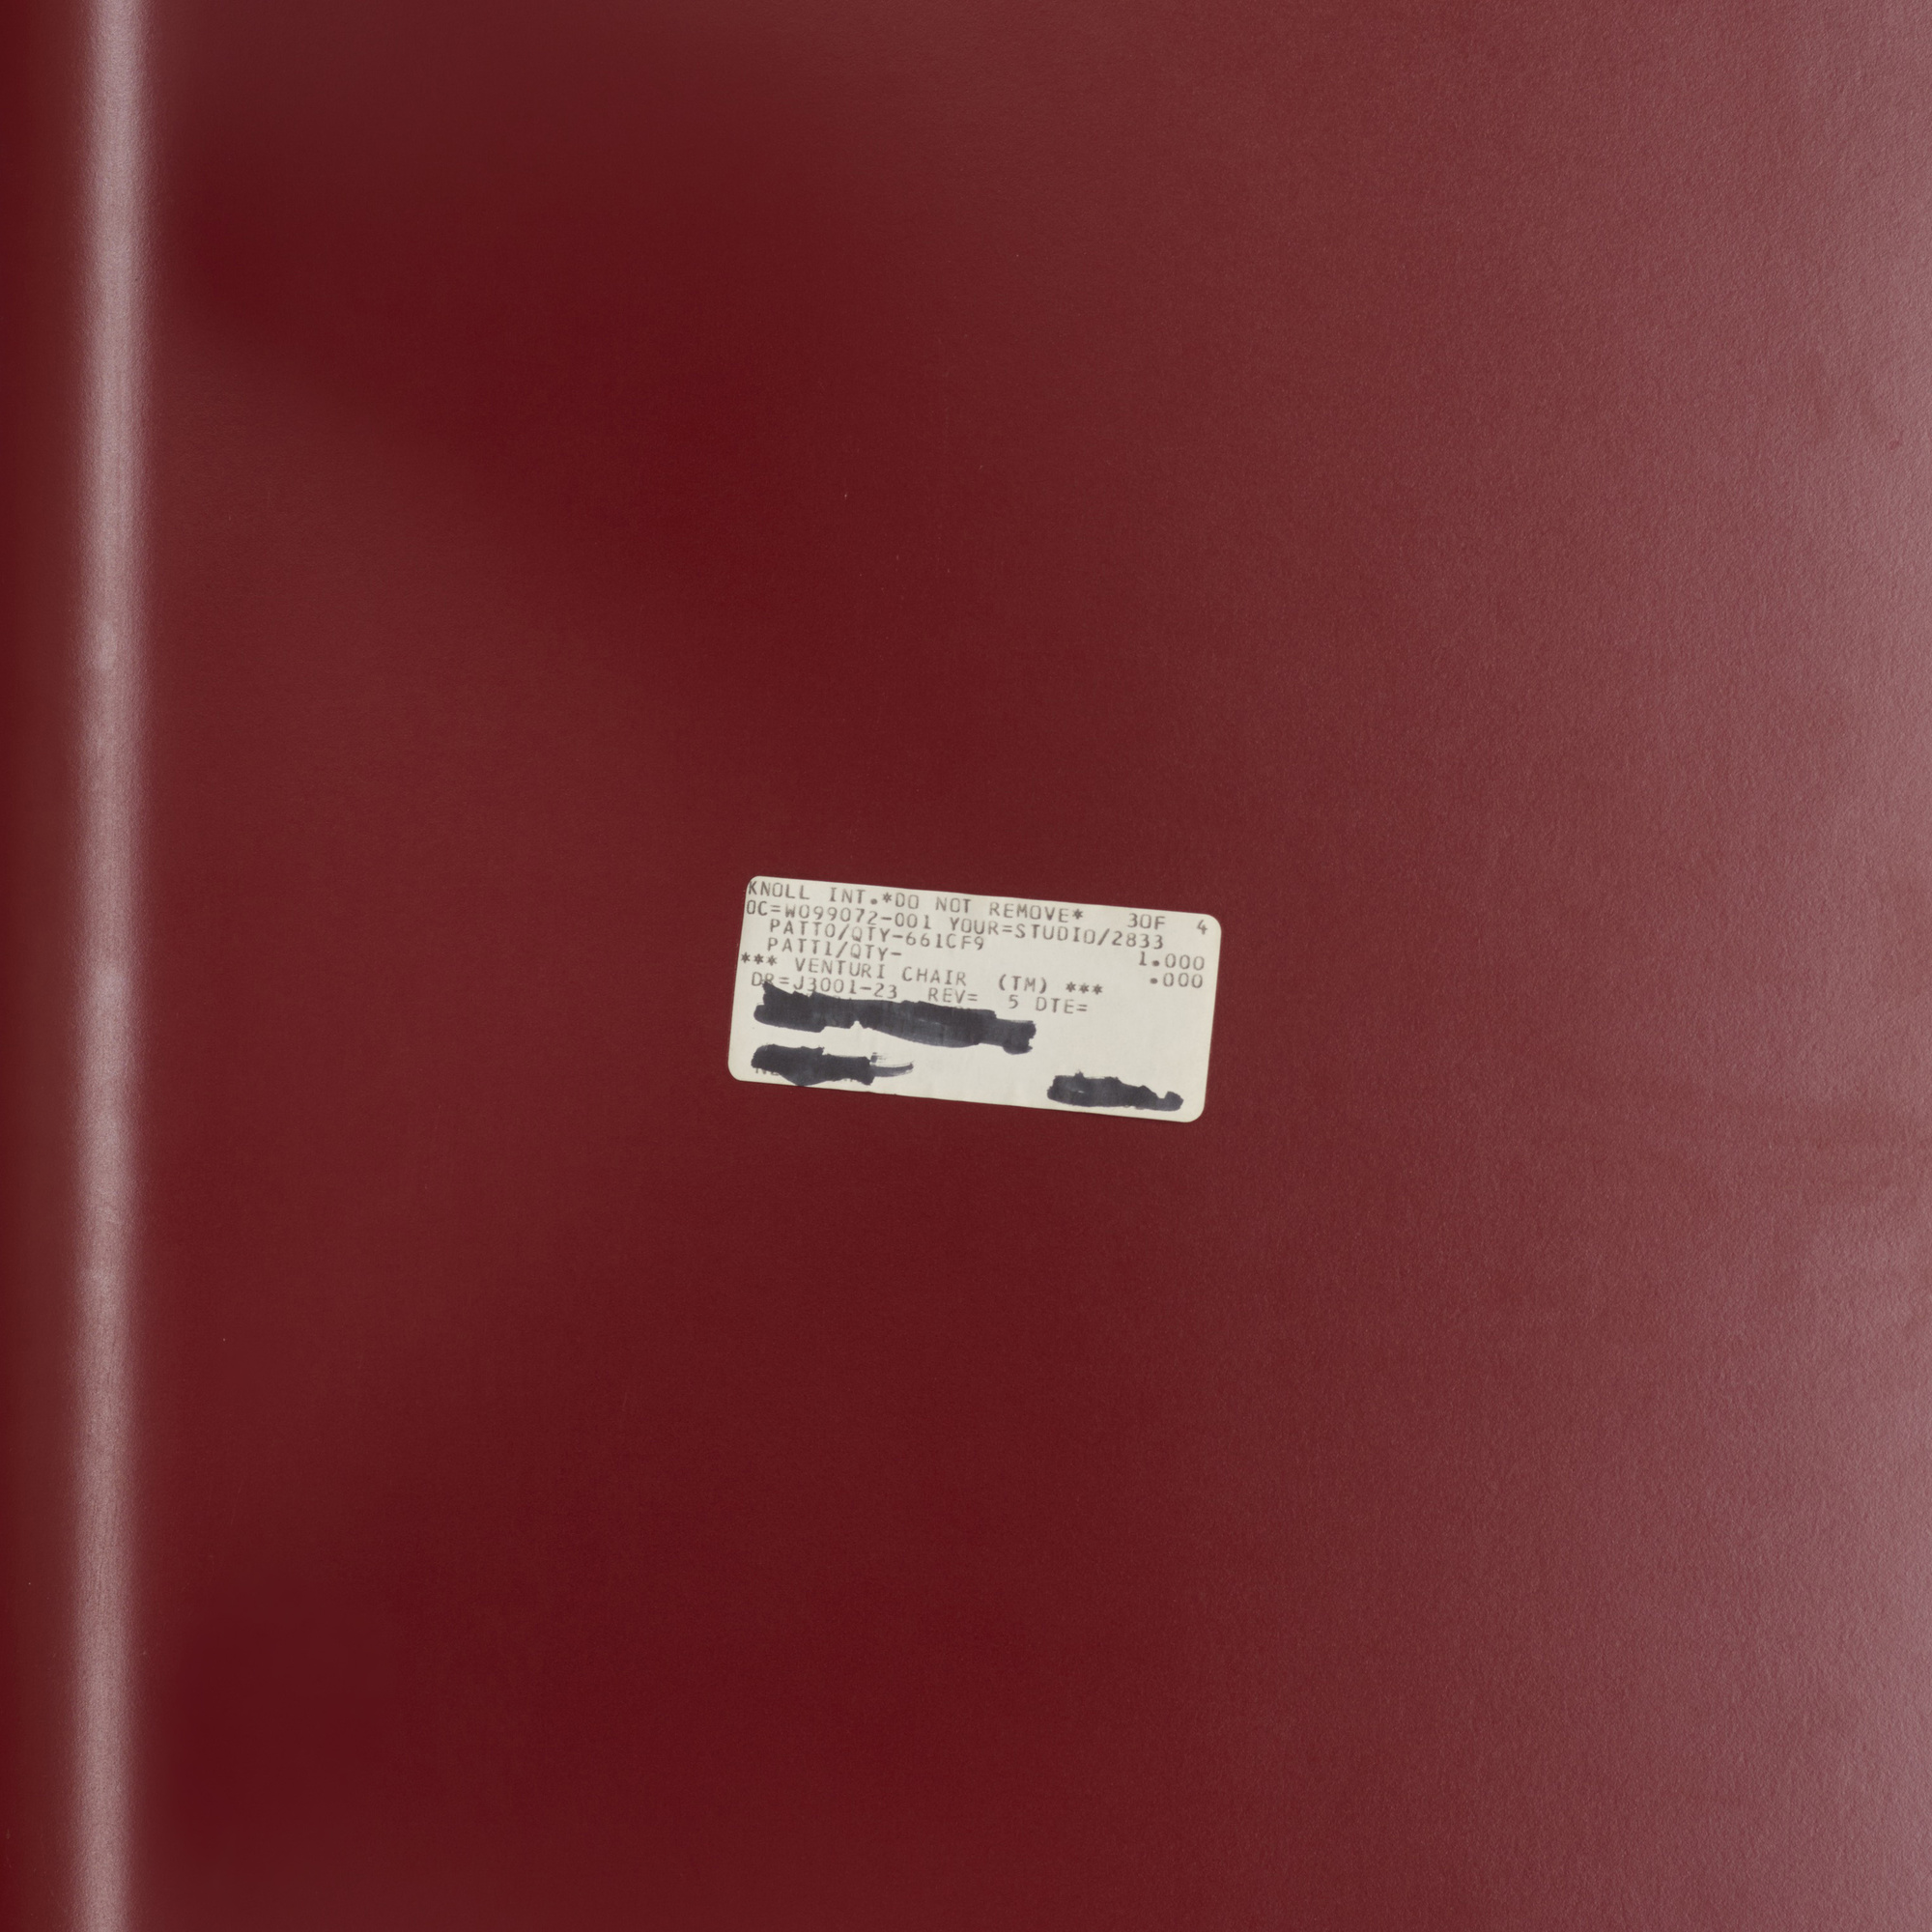 211: Robert Venturi with Denise Scott Brown / Queen Anne chairs, pair (3 of 3)